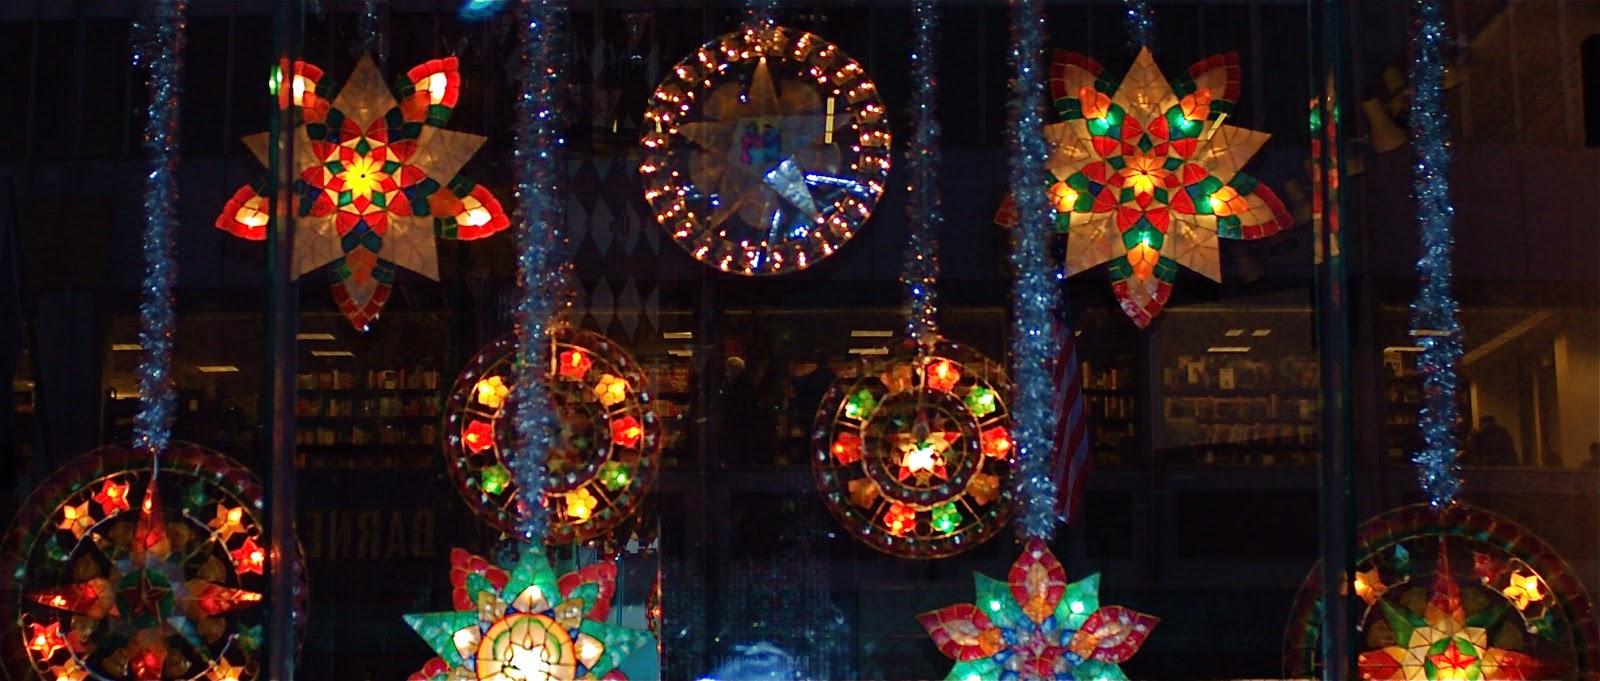 NYC ♥ NYC: Capiz Shell Christmas Lanterns Adorn Philippine ...